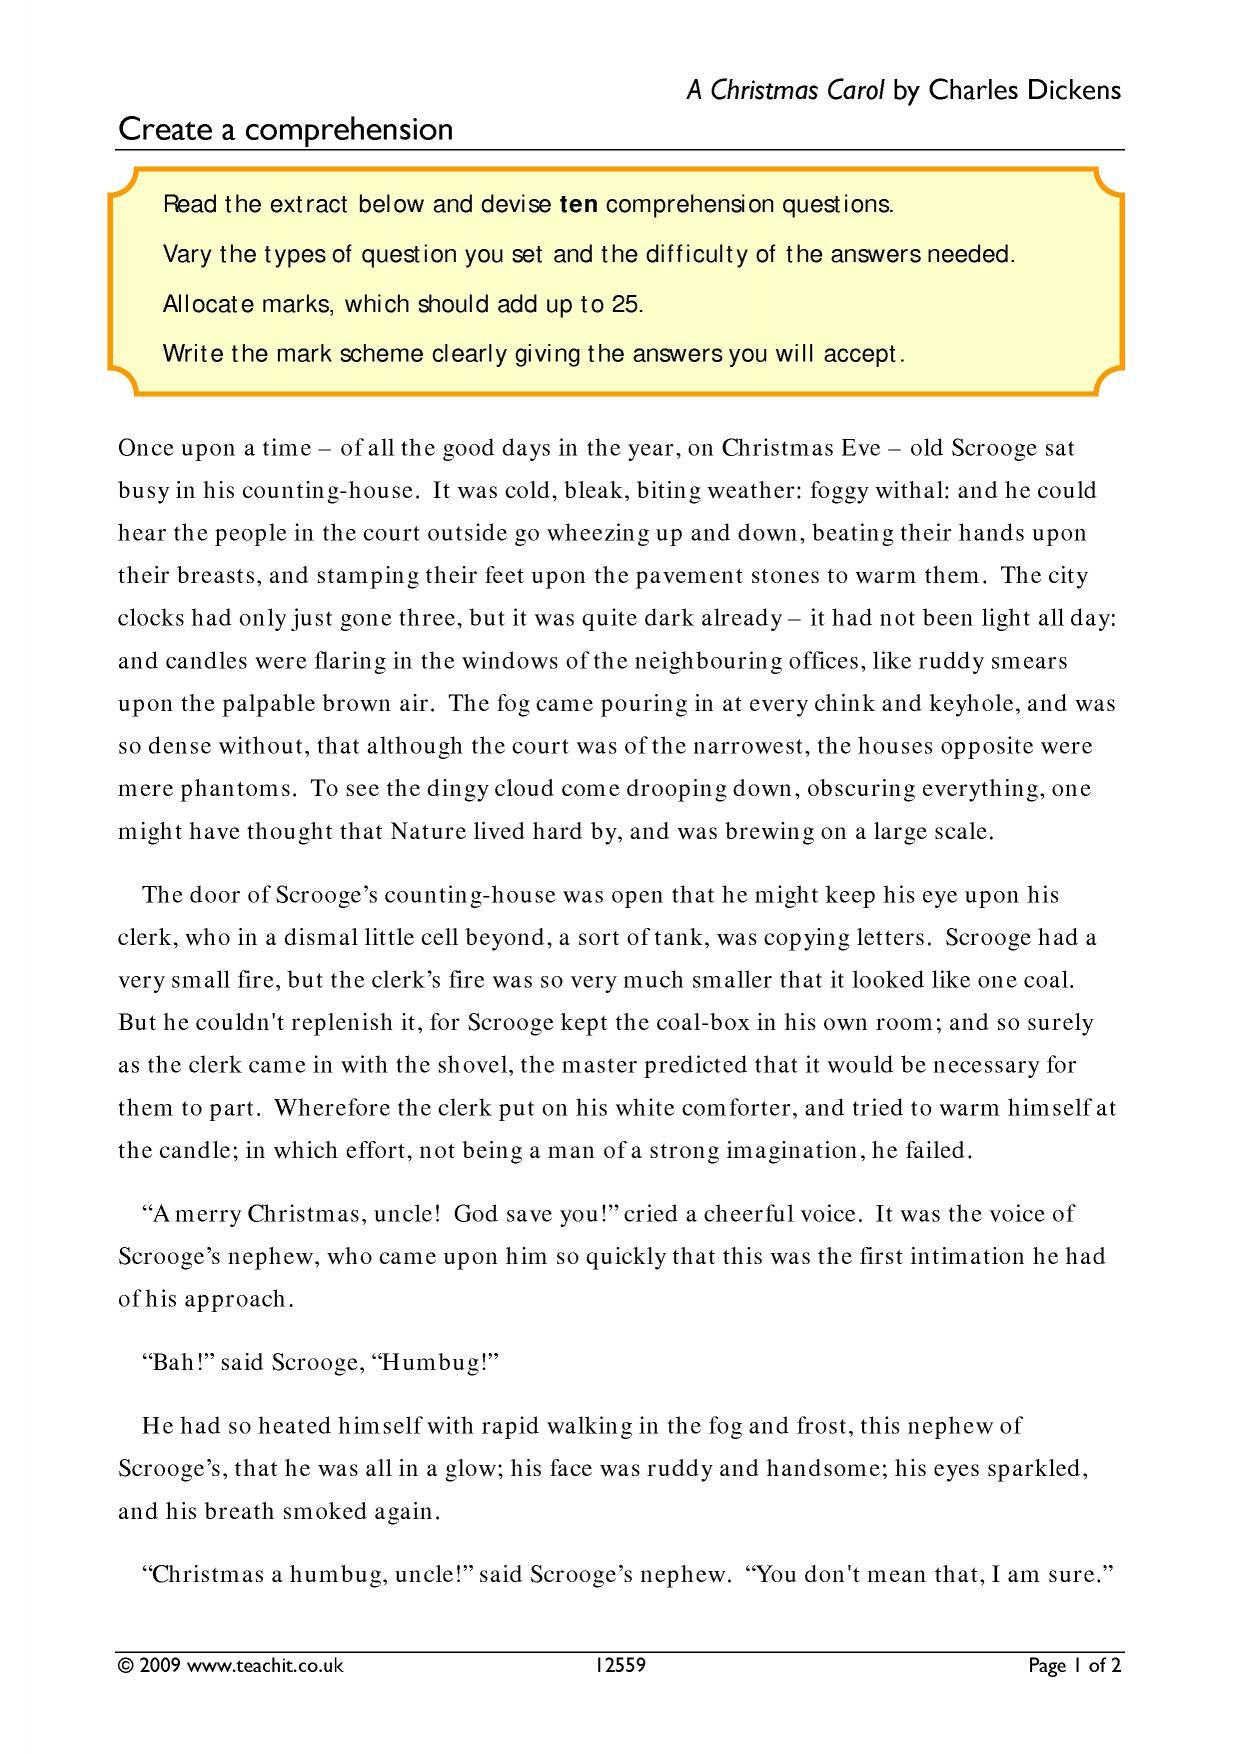 A Christmas Carol Worksheet Answers